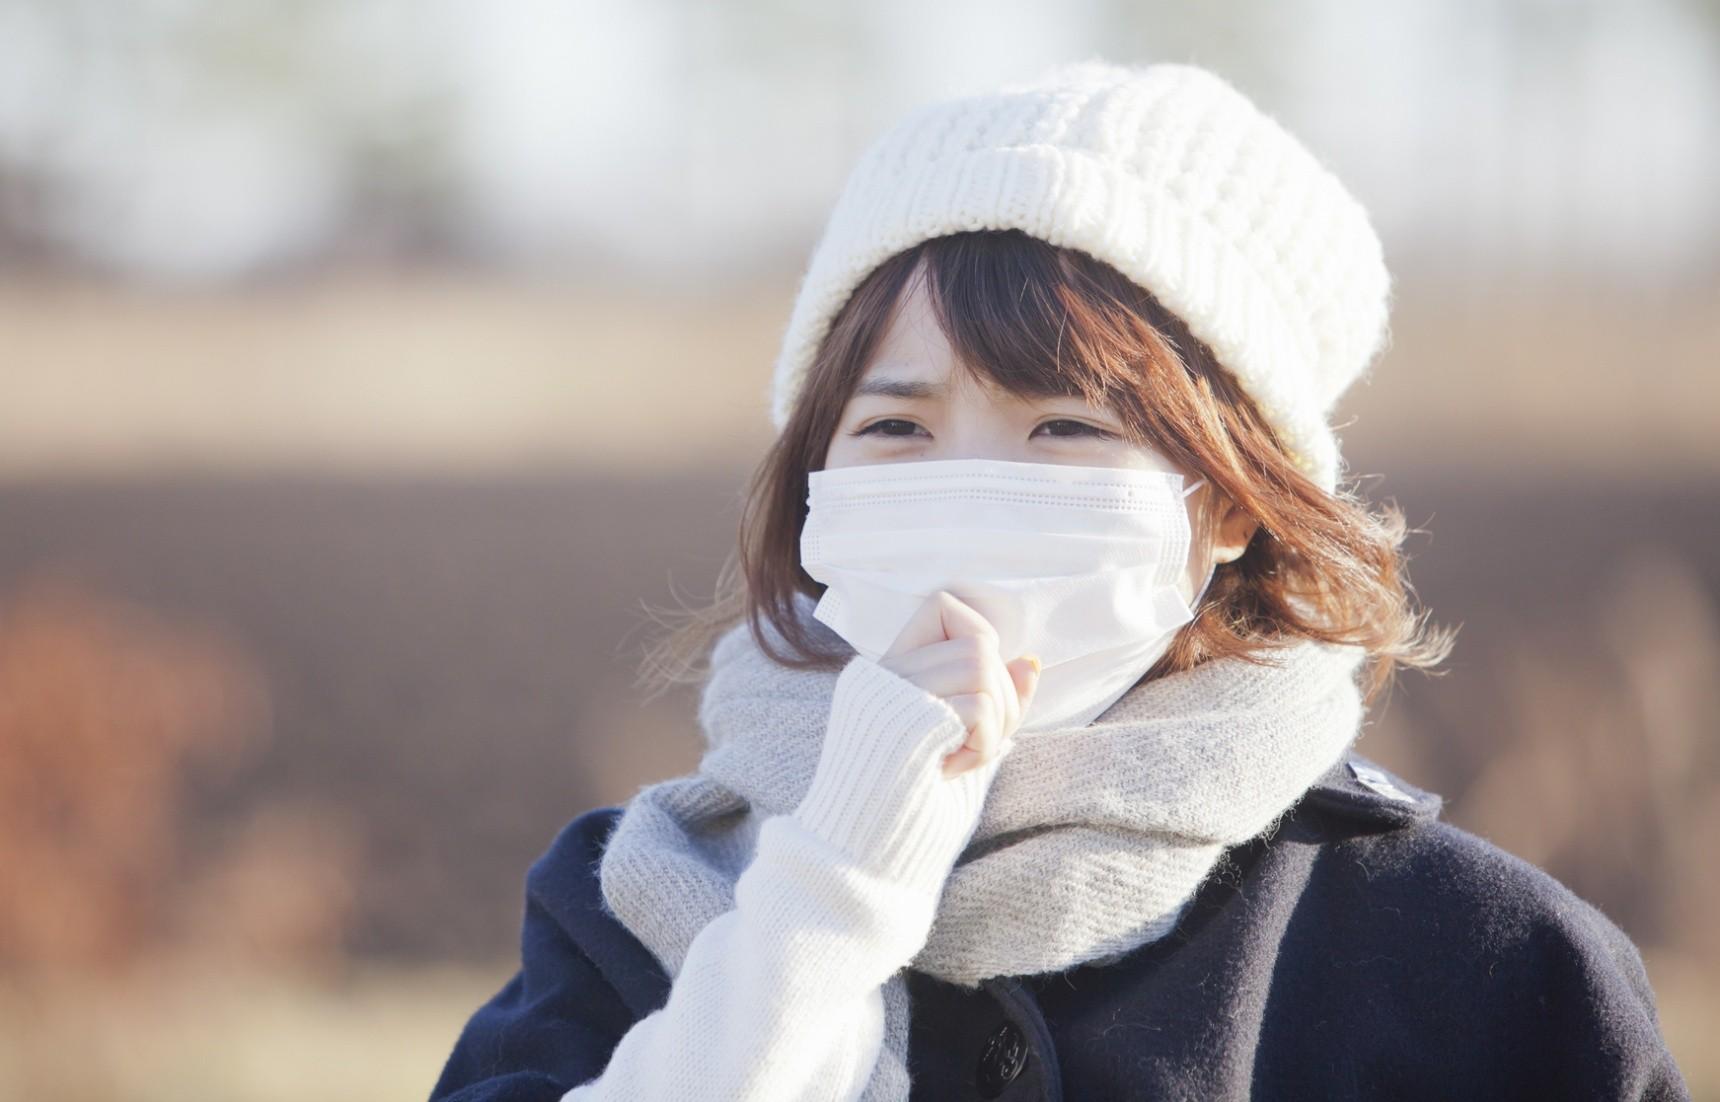 img 5a505644e5ddc.png - 日本特有?花粉症は海外ではない?